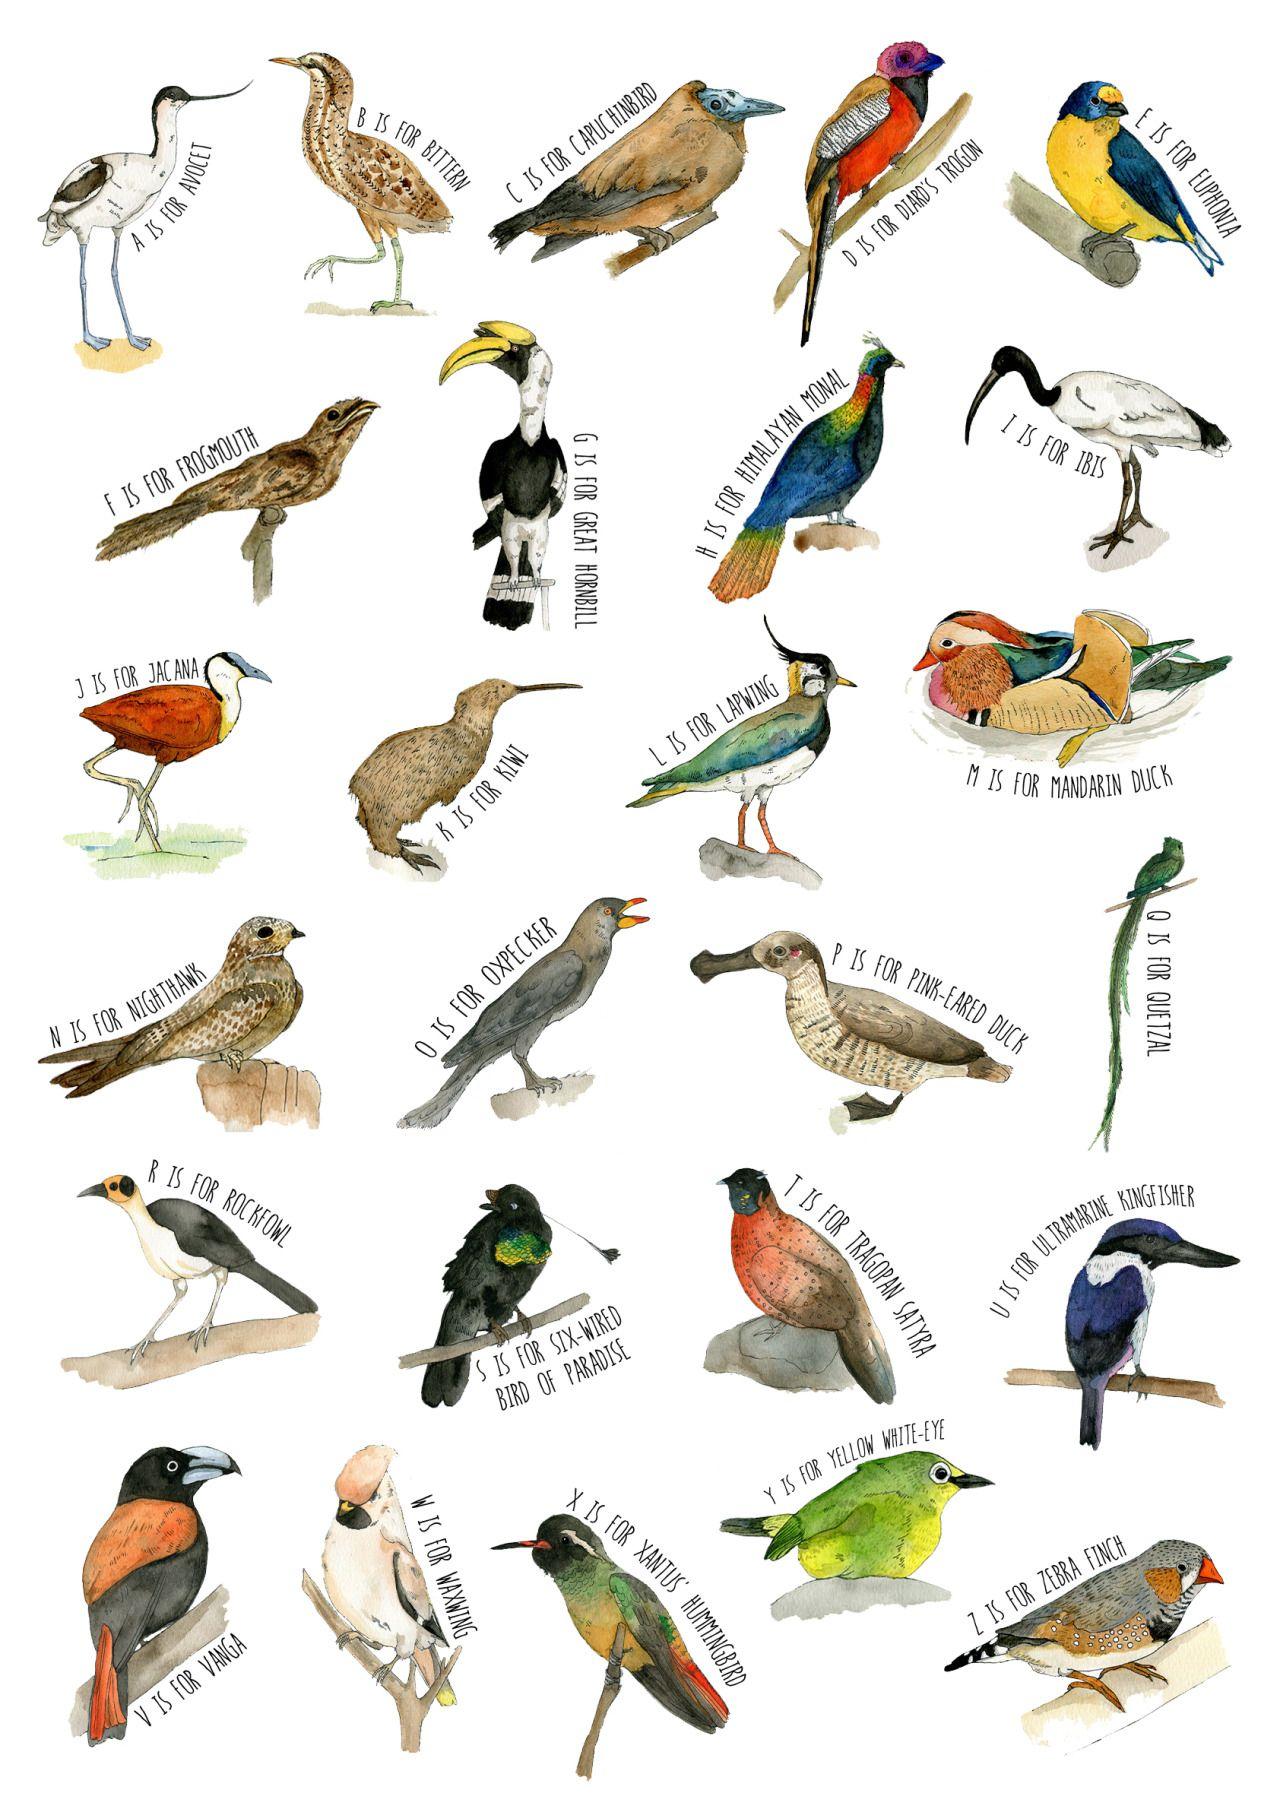 Zsazsabellagio Animals Name List Card Illustration Illustration